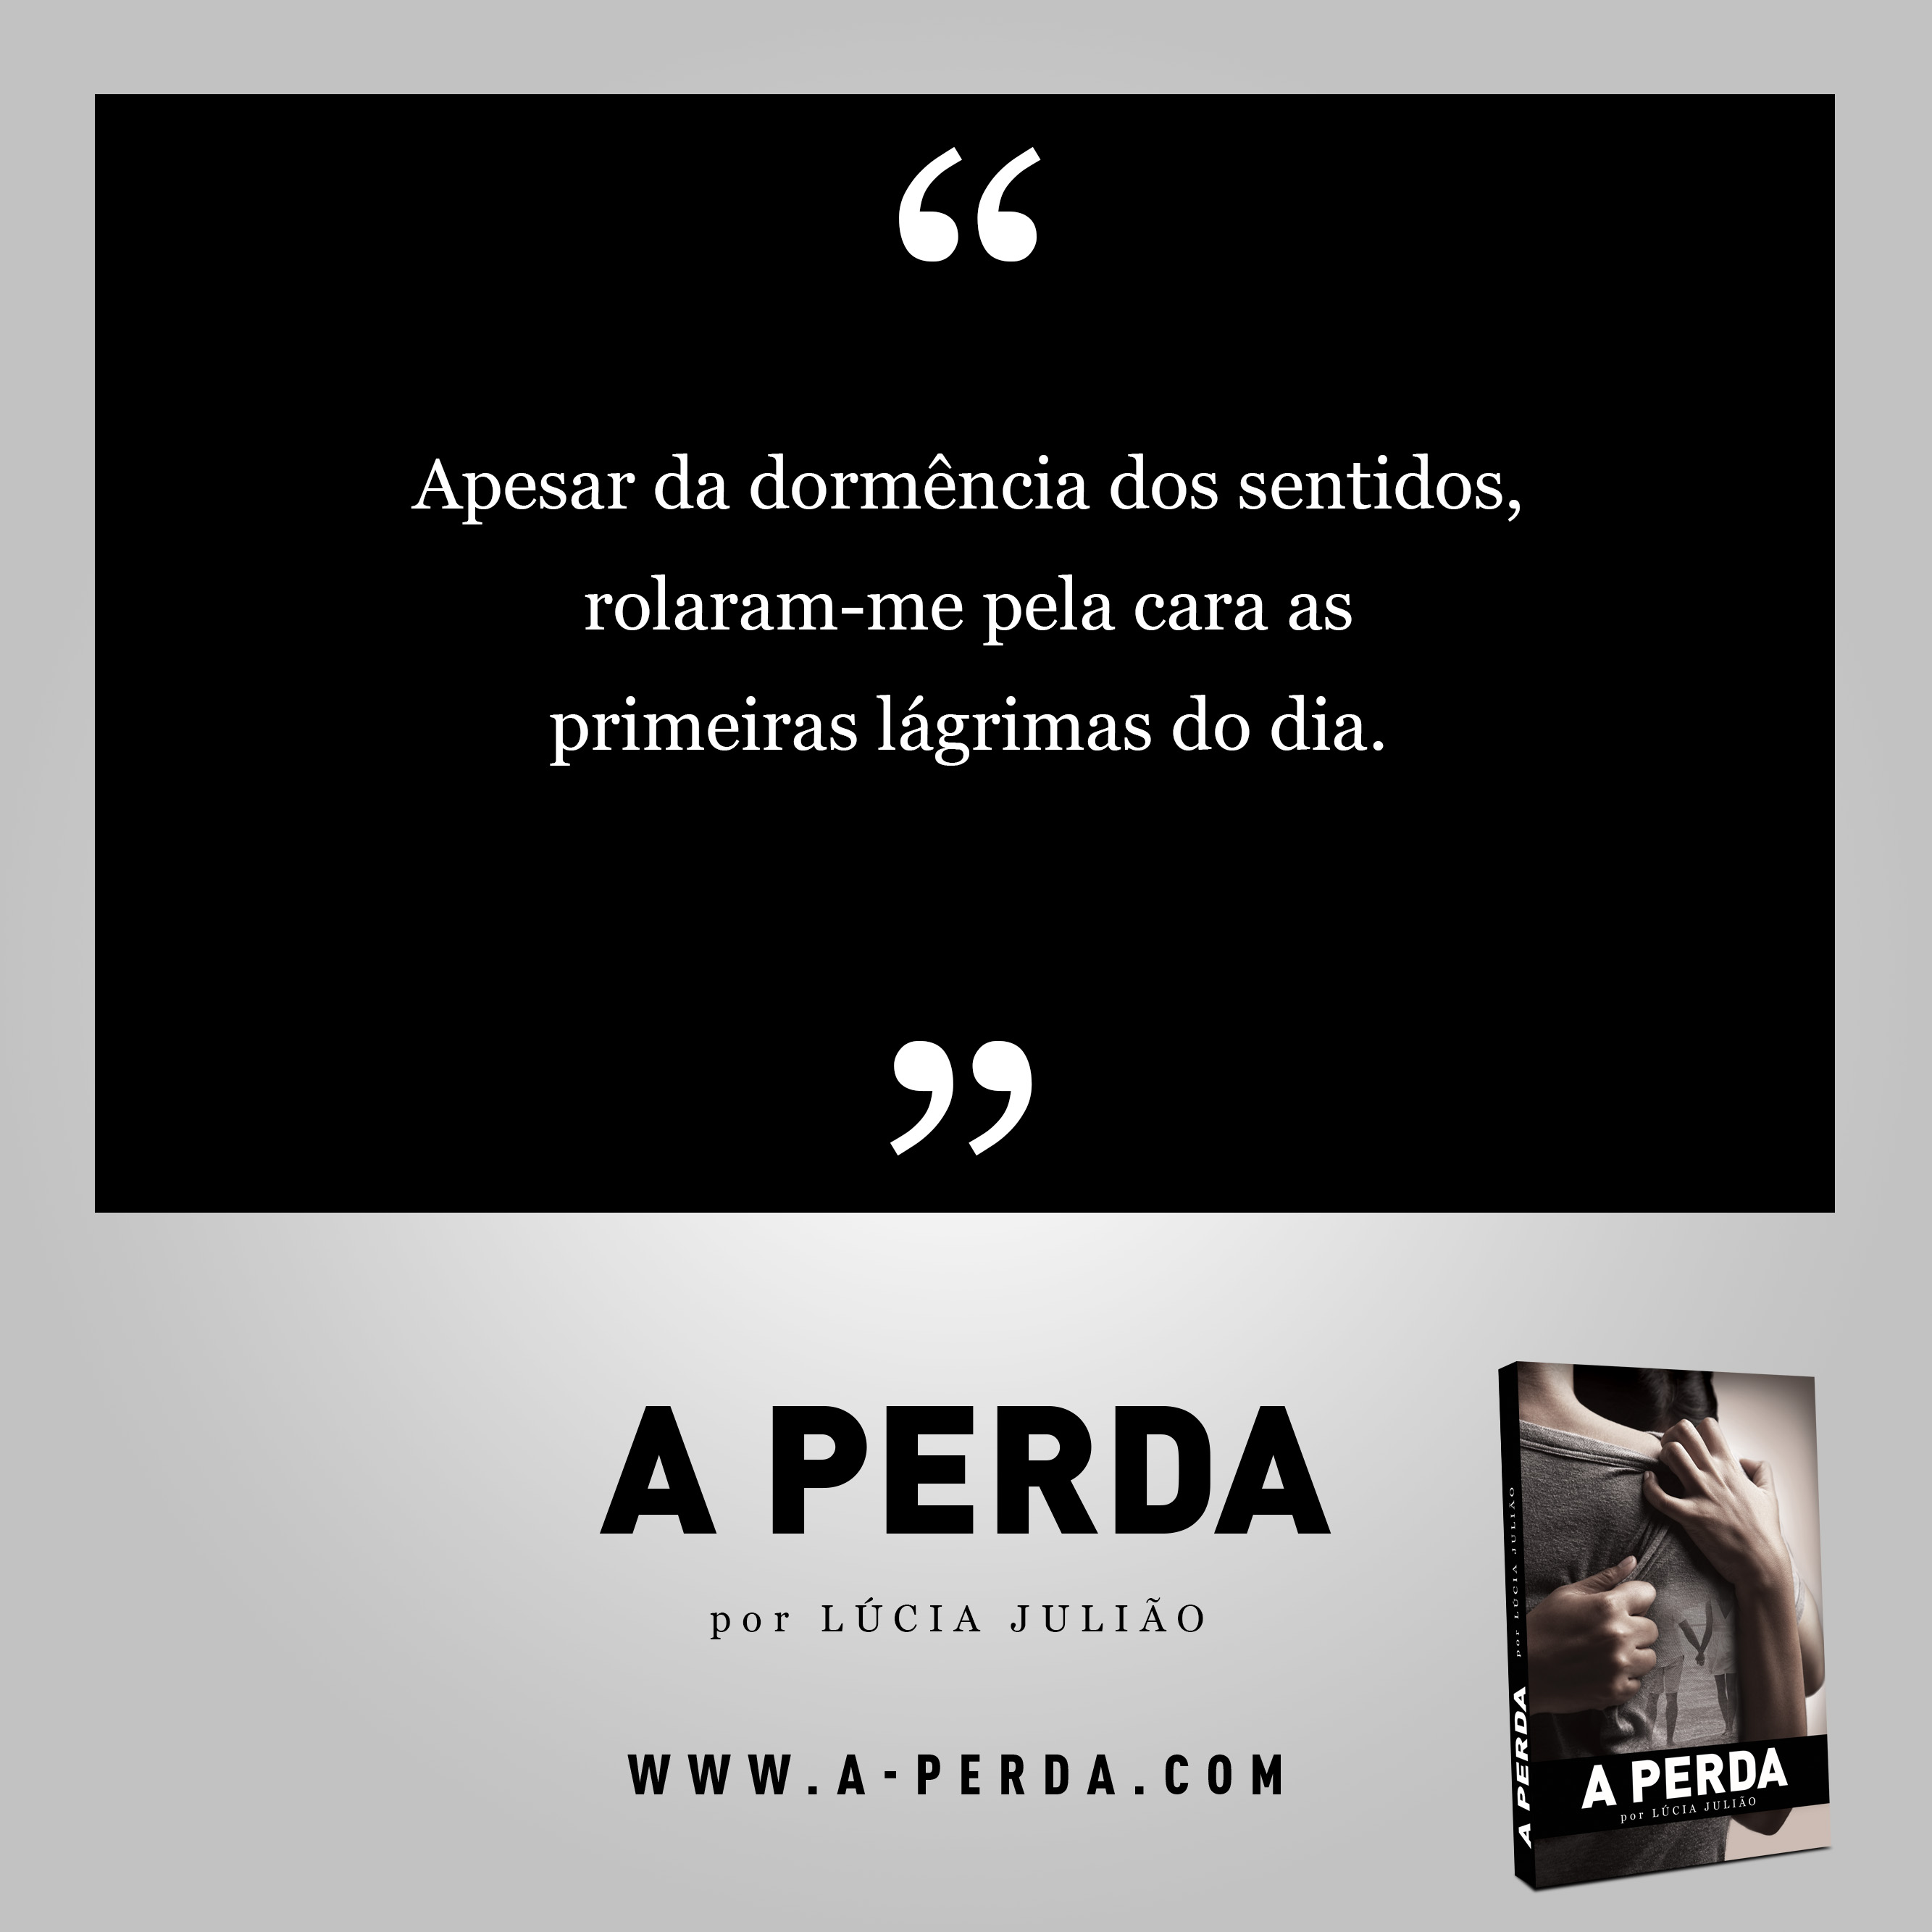 015-capitulo-42-livro-a-Perda-de-Lucia-Juliao-Instagram